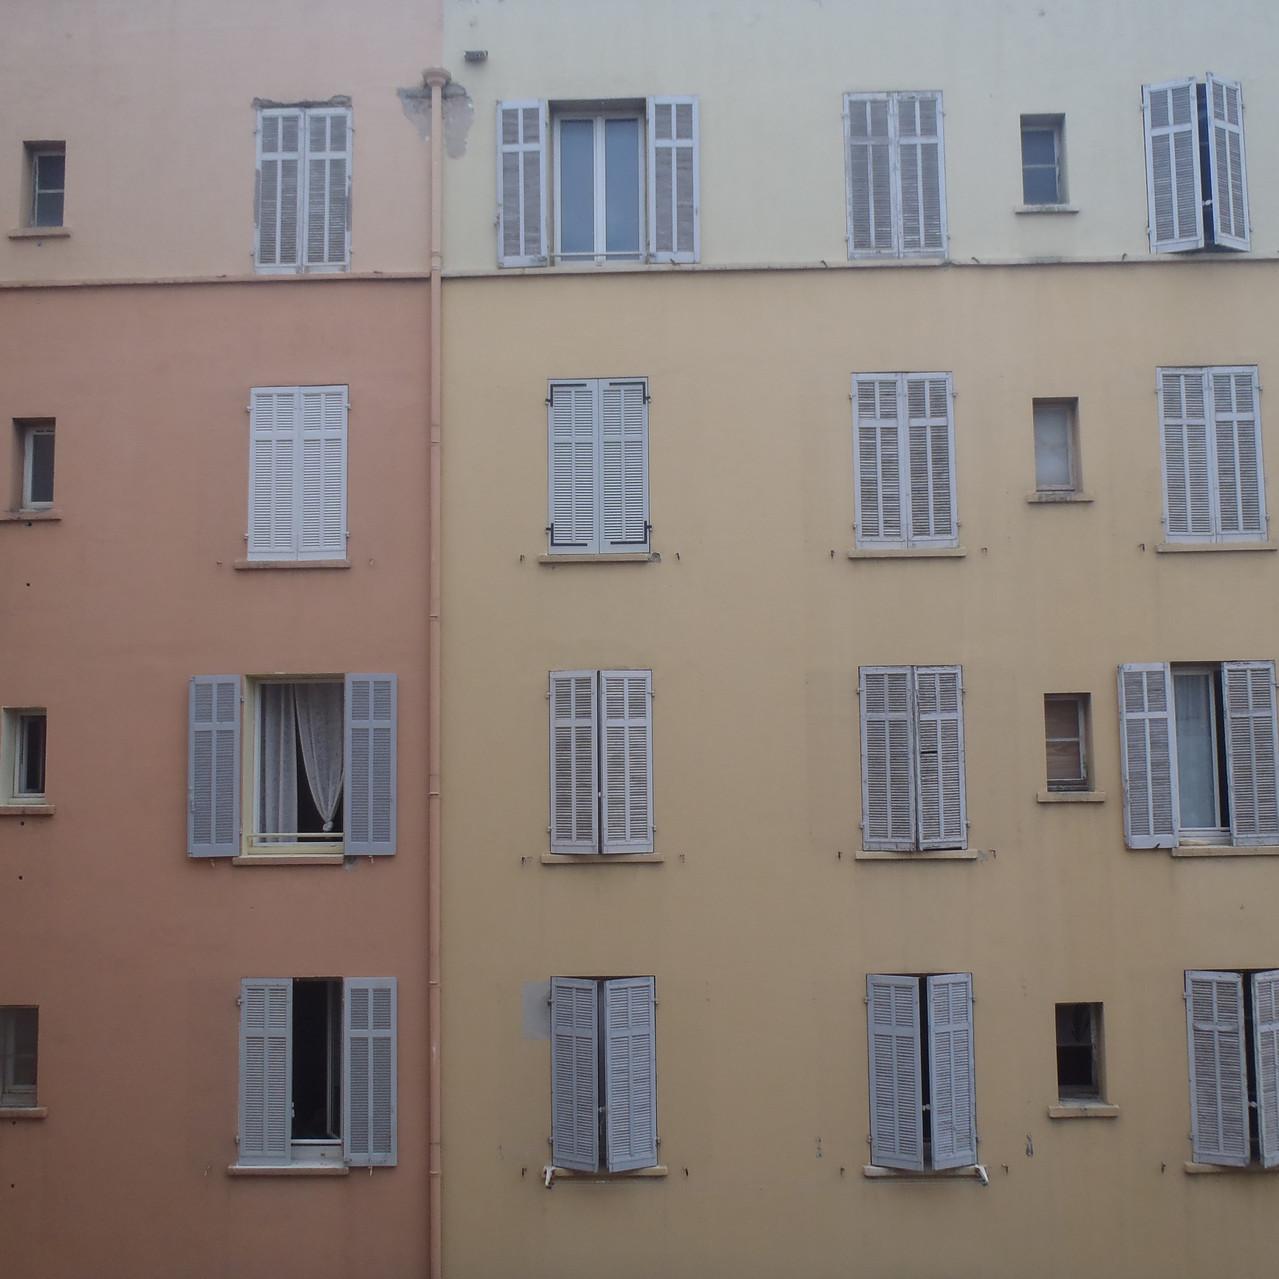 Marseille buildings